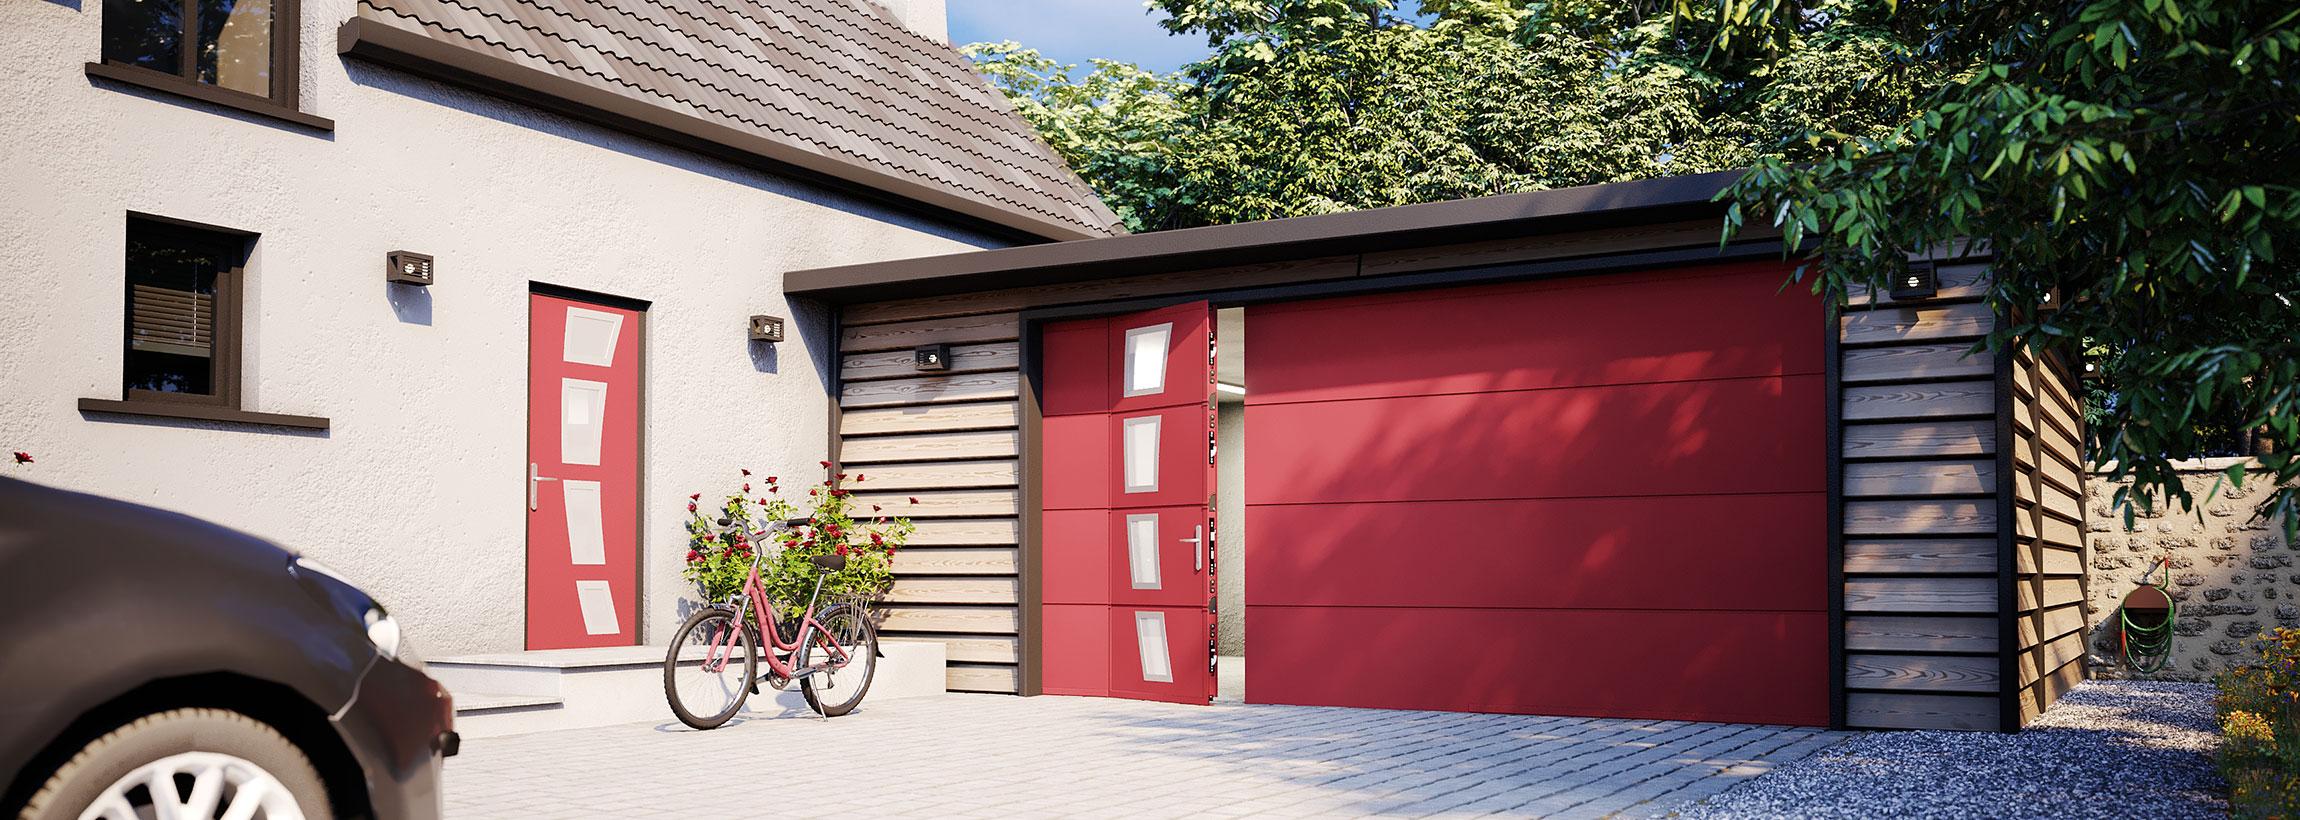 Anjou Confort - Portes de garage